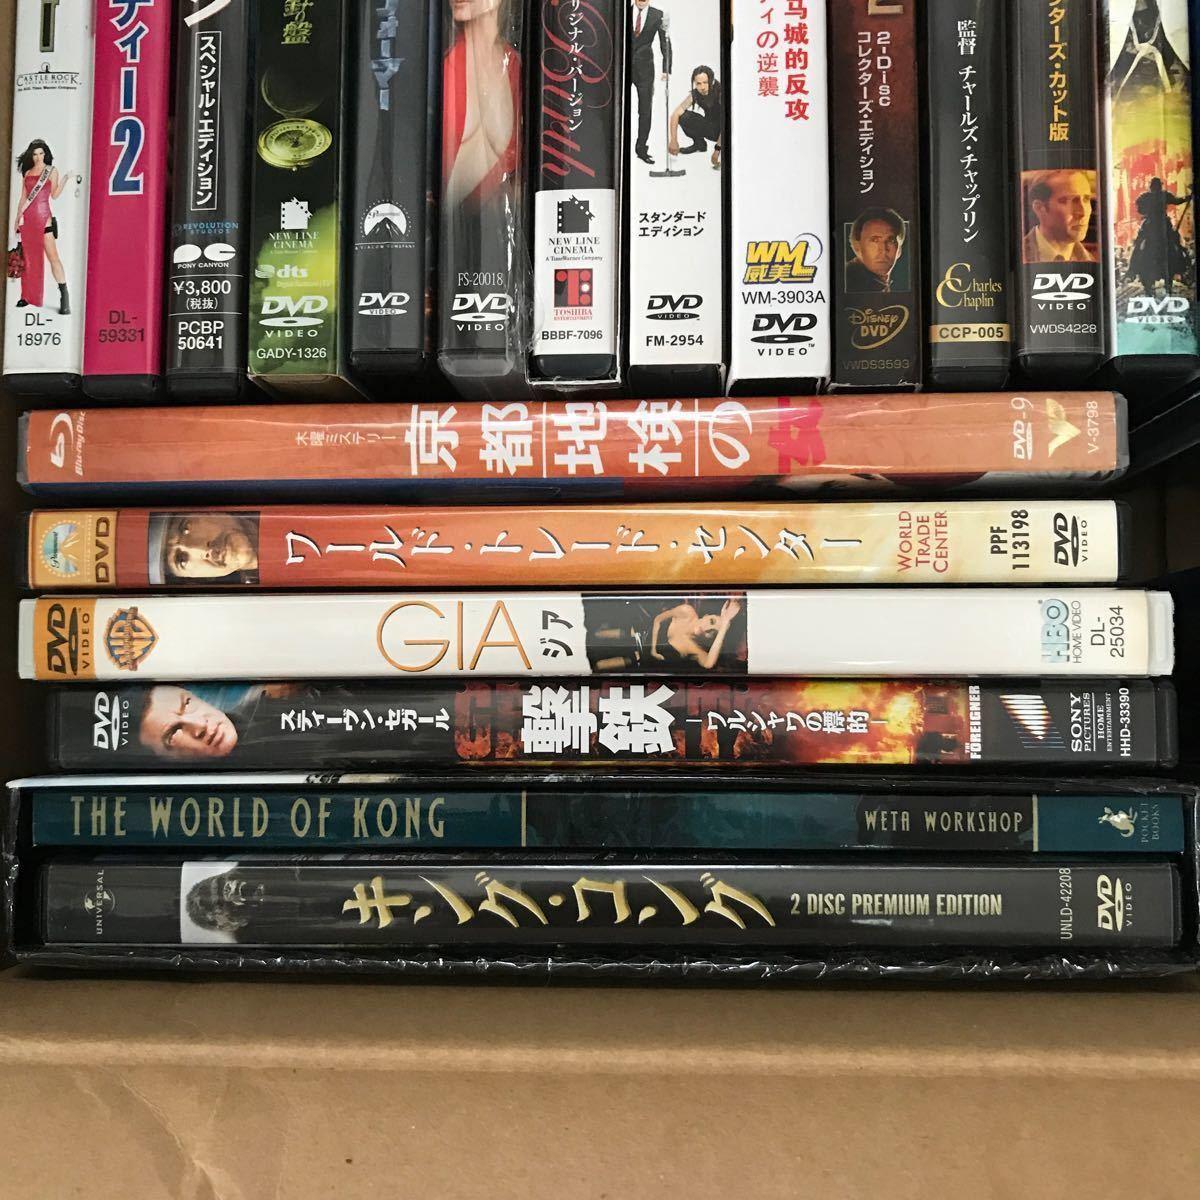 DVD、Blu-ray、CD 色々37枚ジャンク品